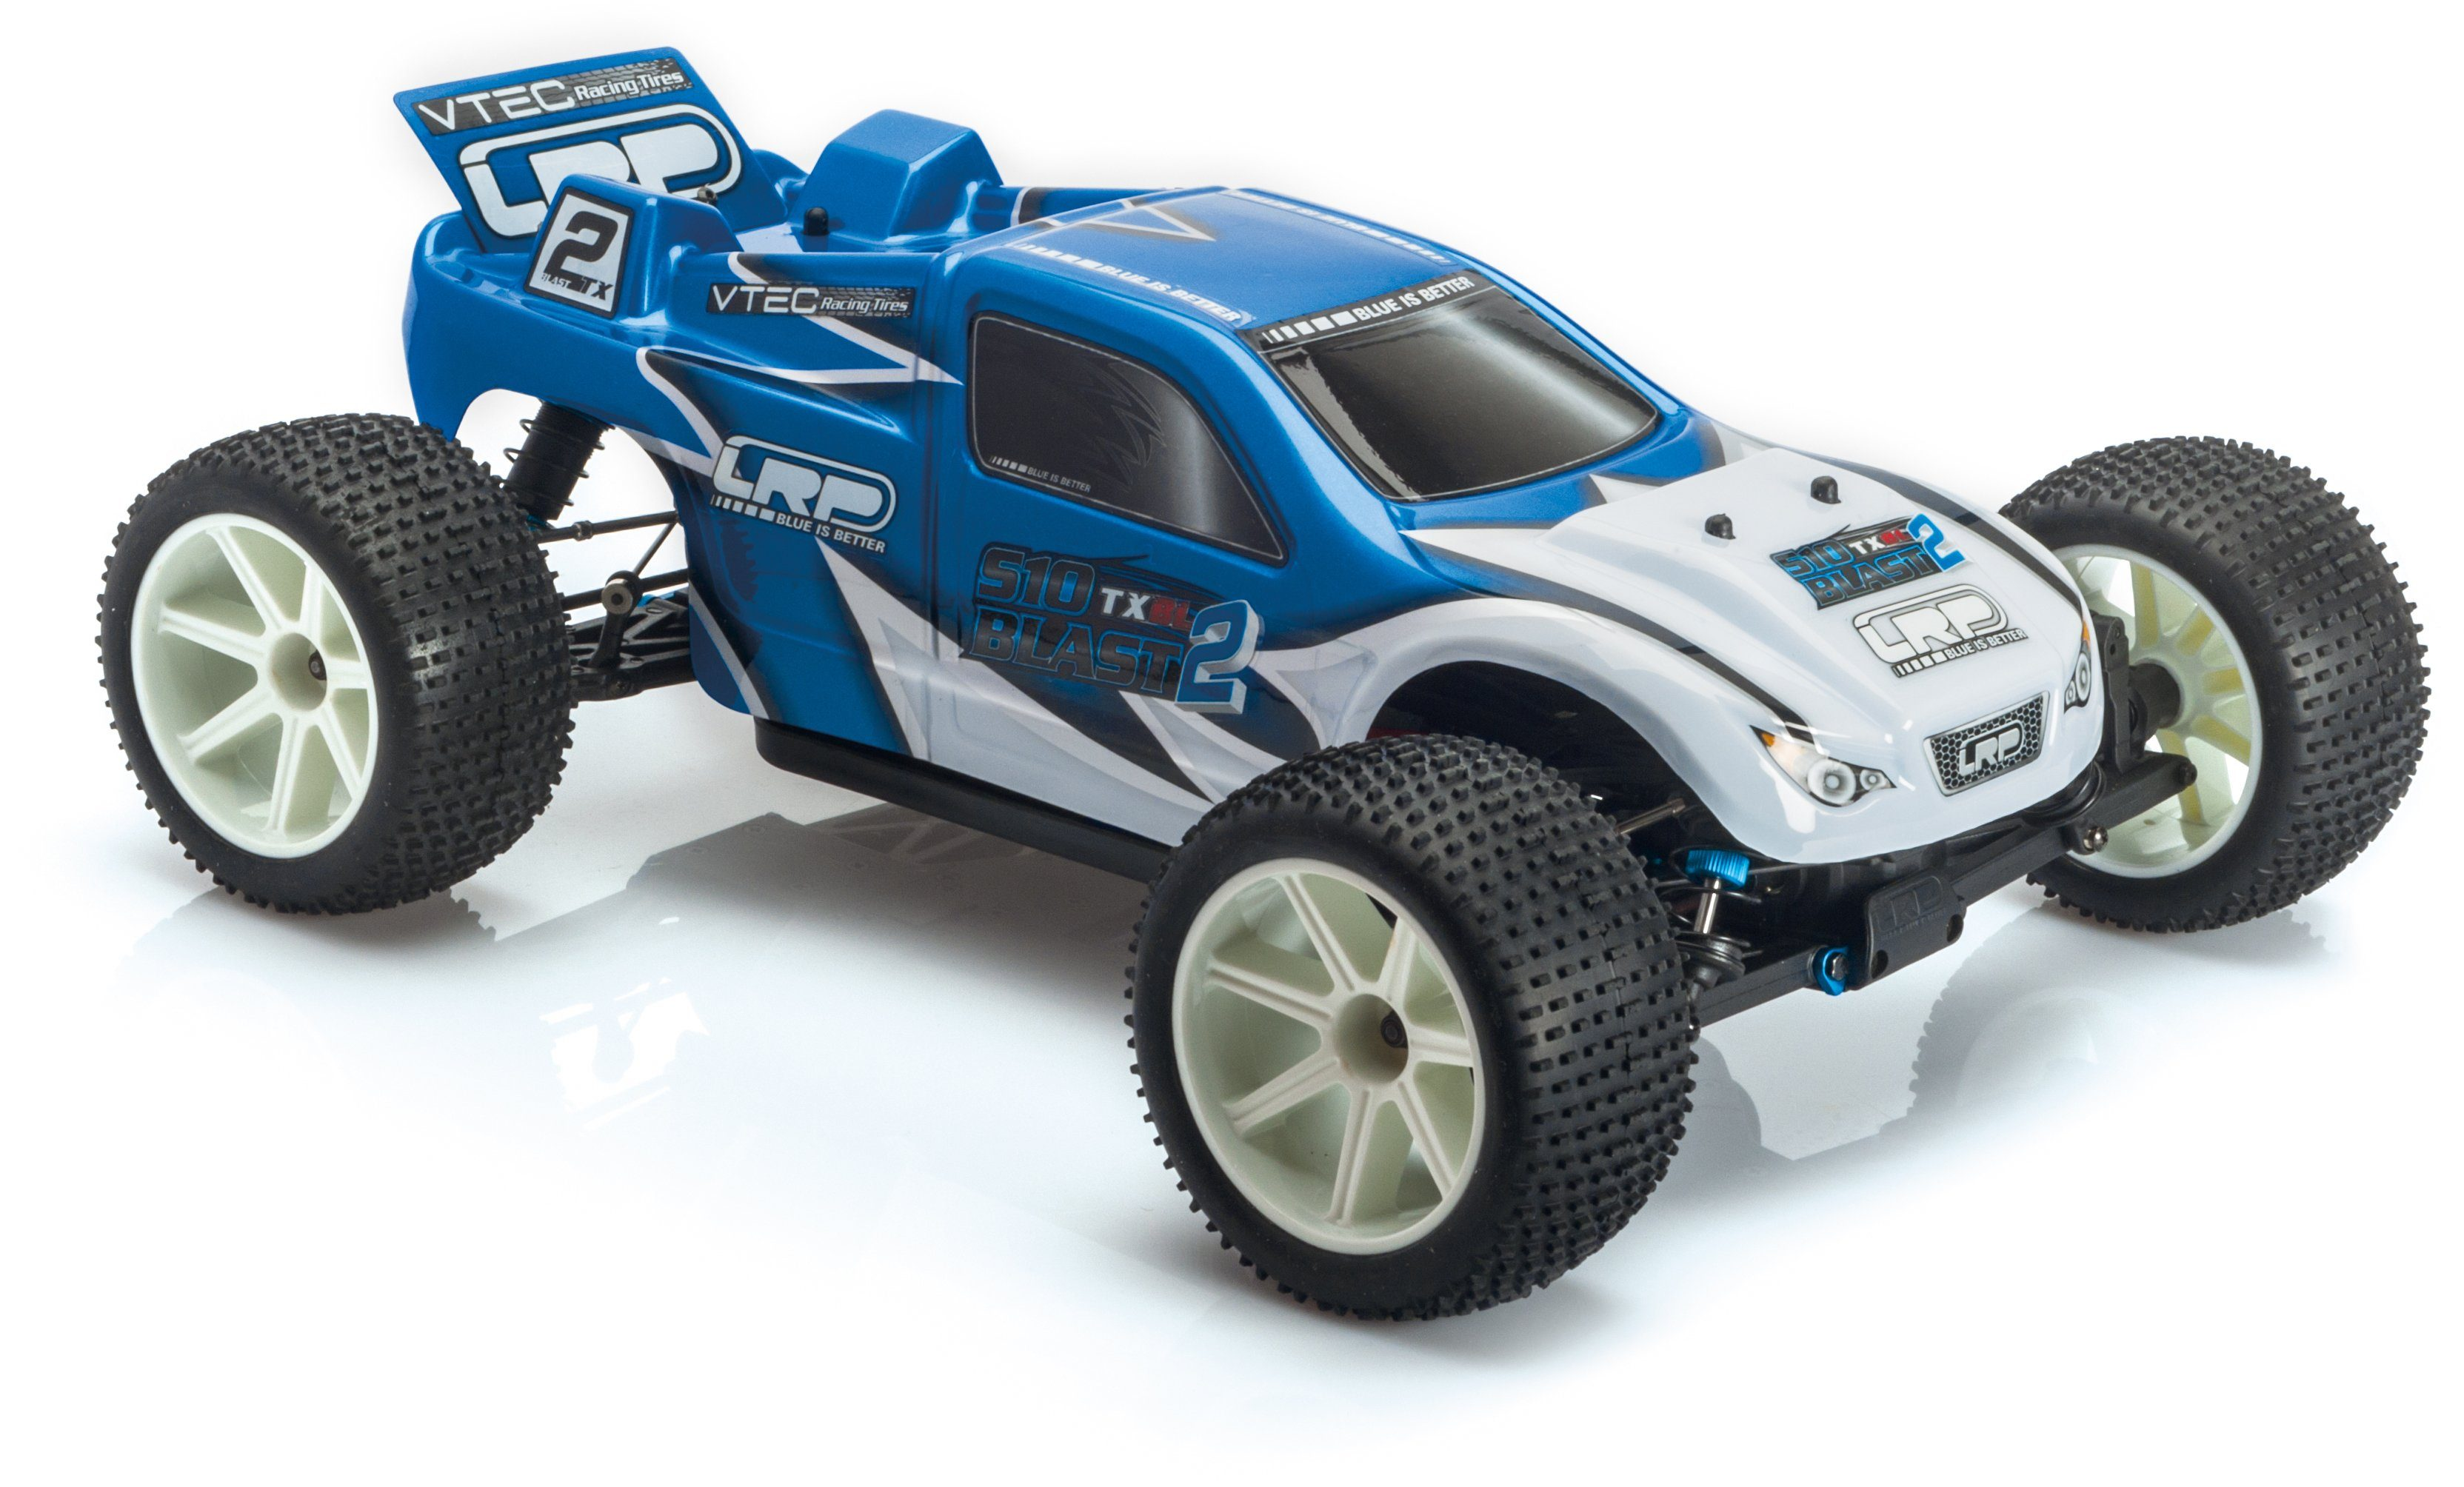 LRP RC Auto, »S10 Blast TX 2 Brushless 4WD Elektro Truggy 2,4 GHz 1:10«